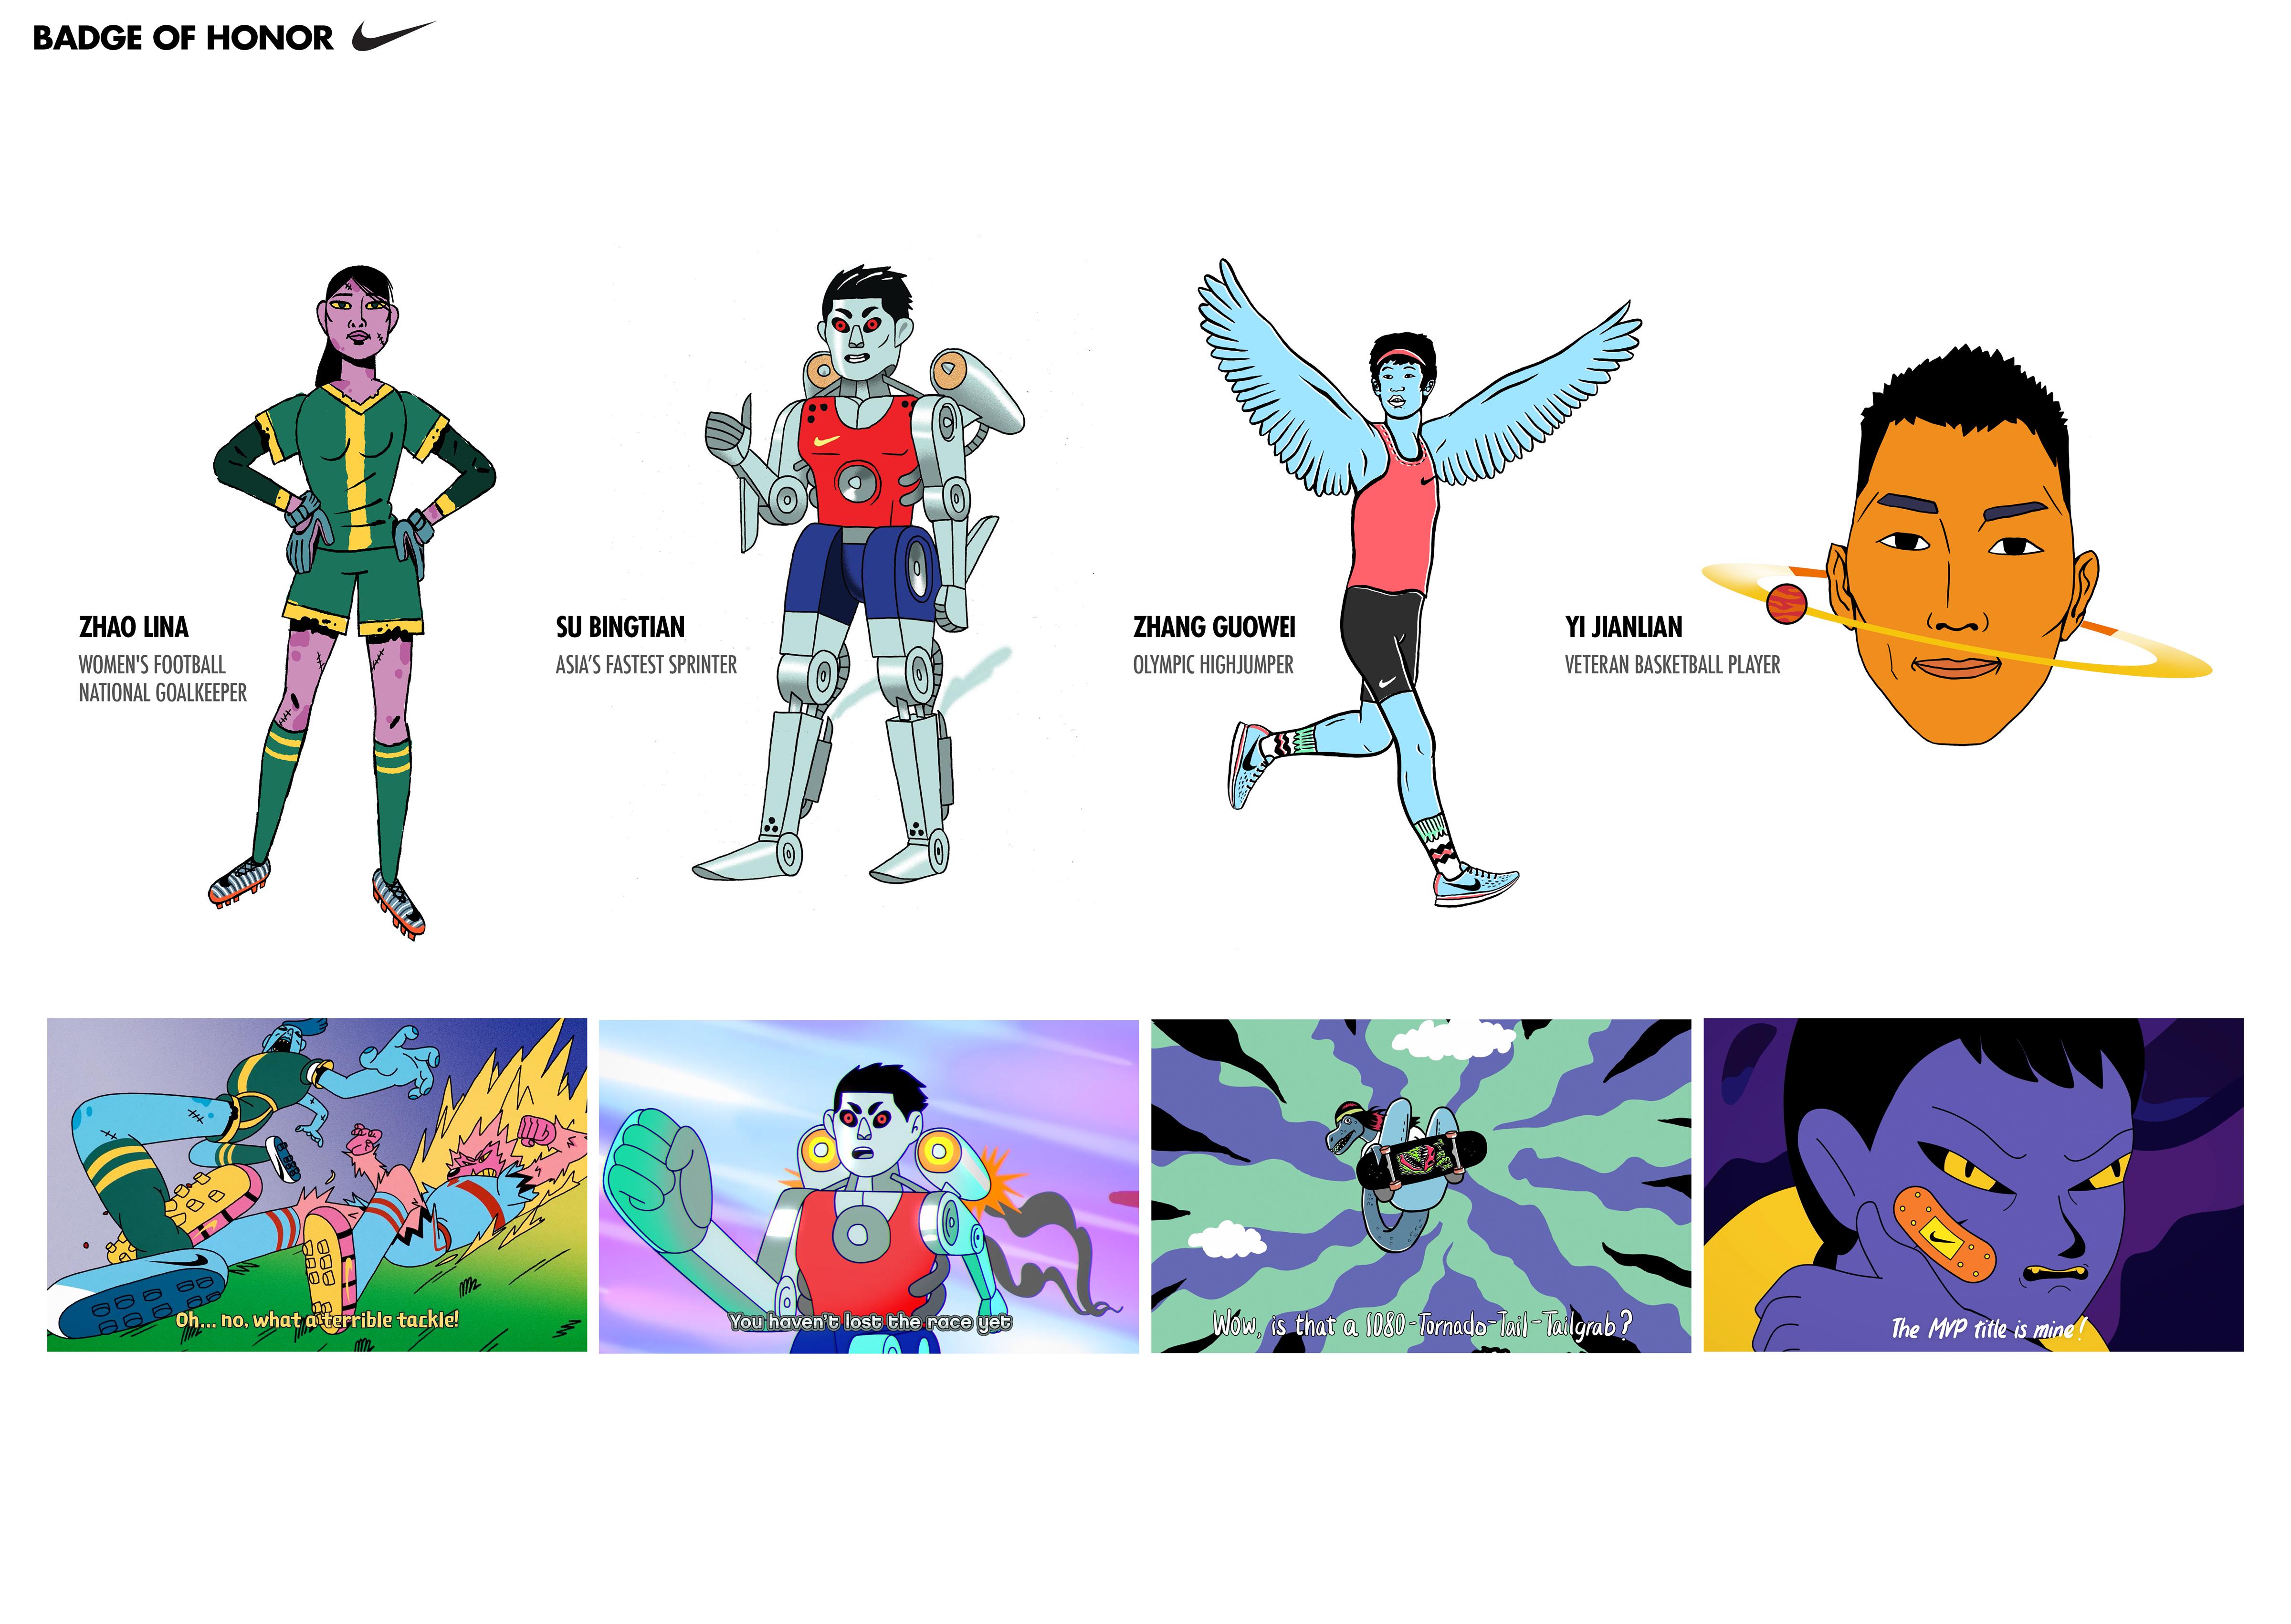 Thumbnail for Nike-Badge of Honor